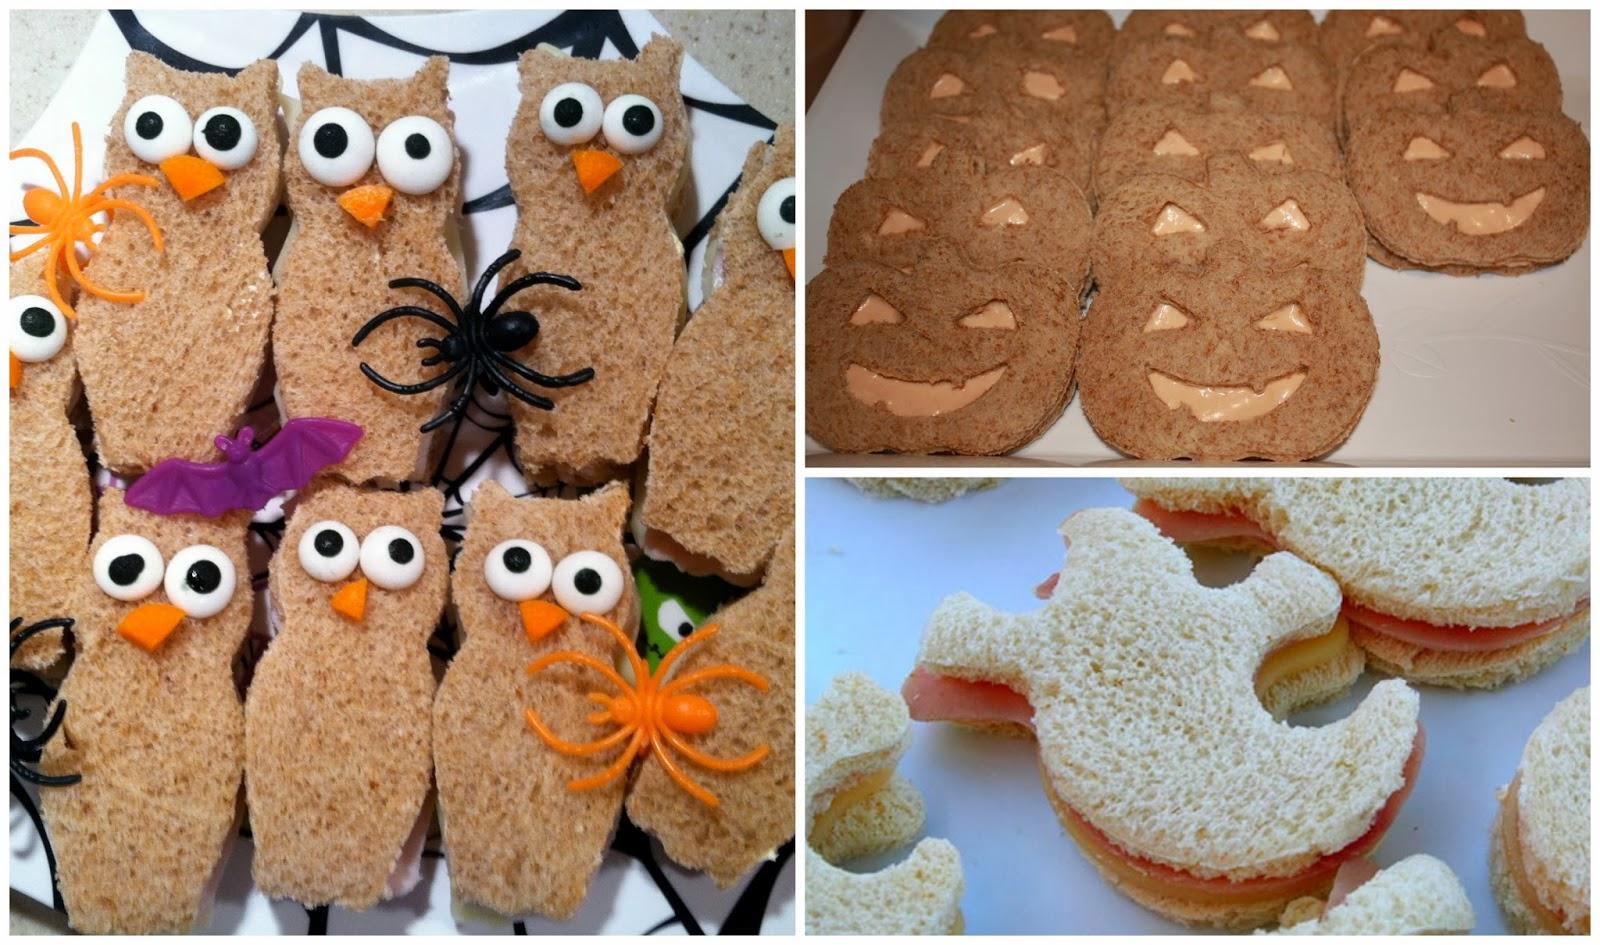 Handbags To Change Bags: Children's Halloween Party Food Ideas